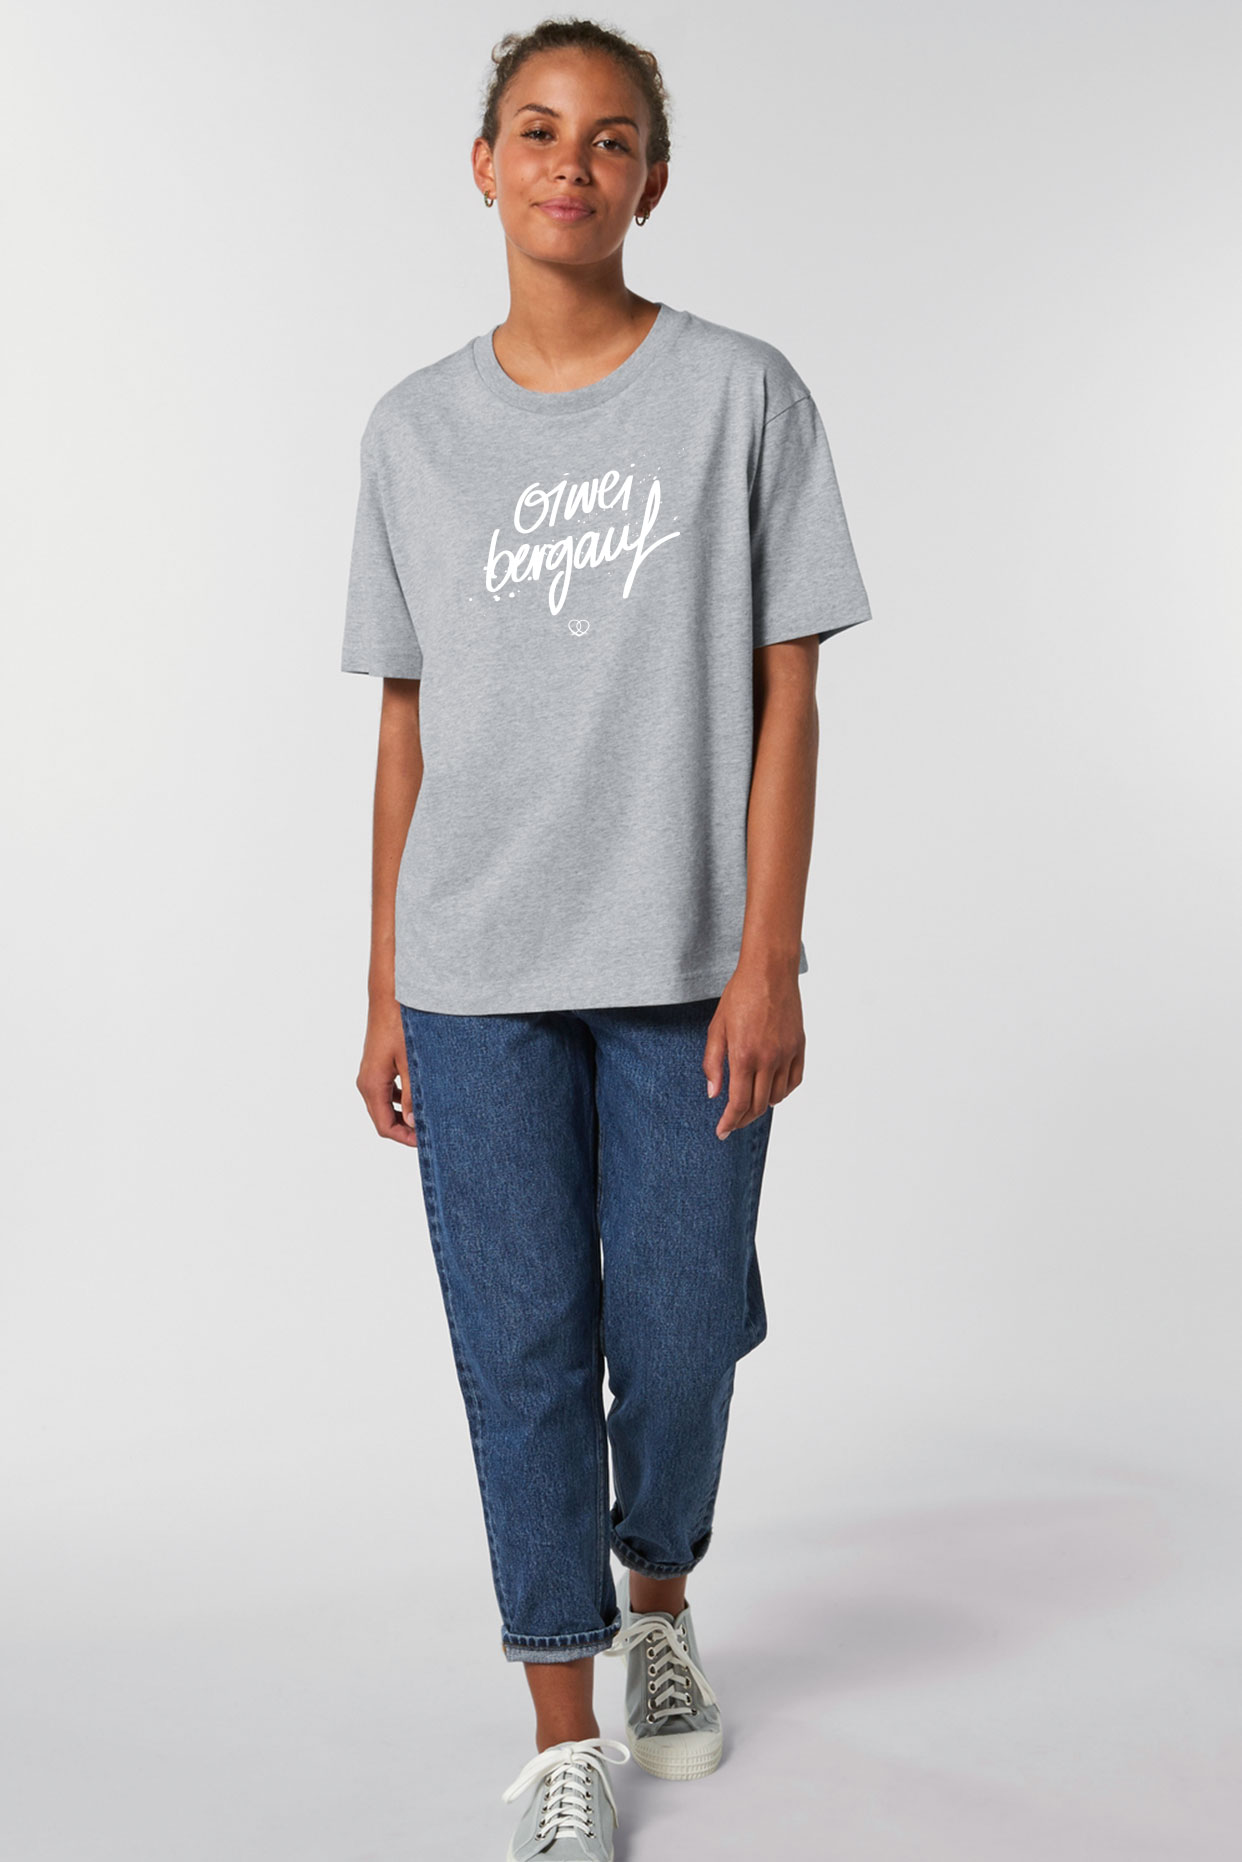 Oiwei Bergauf Unisex T-Shirt